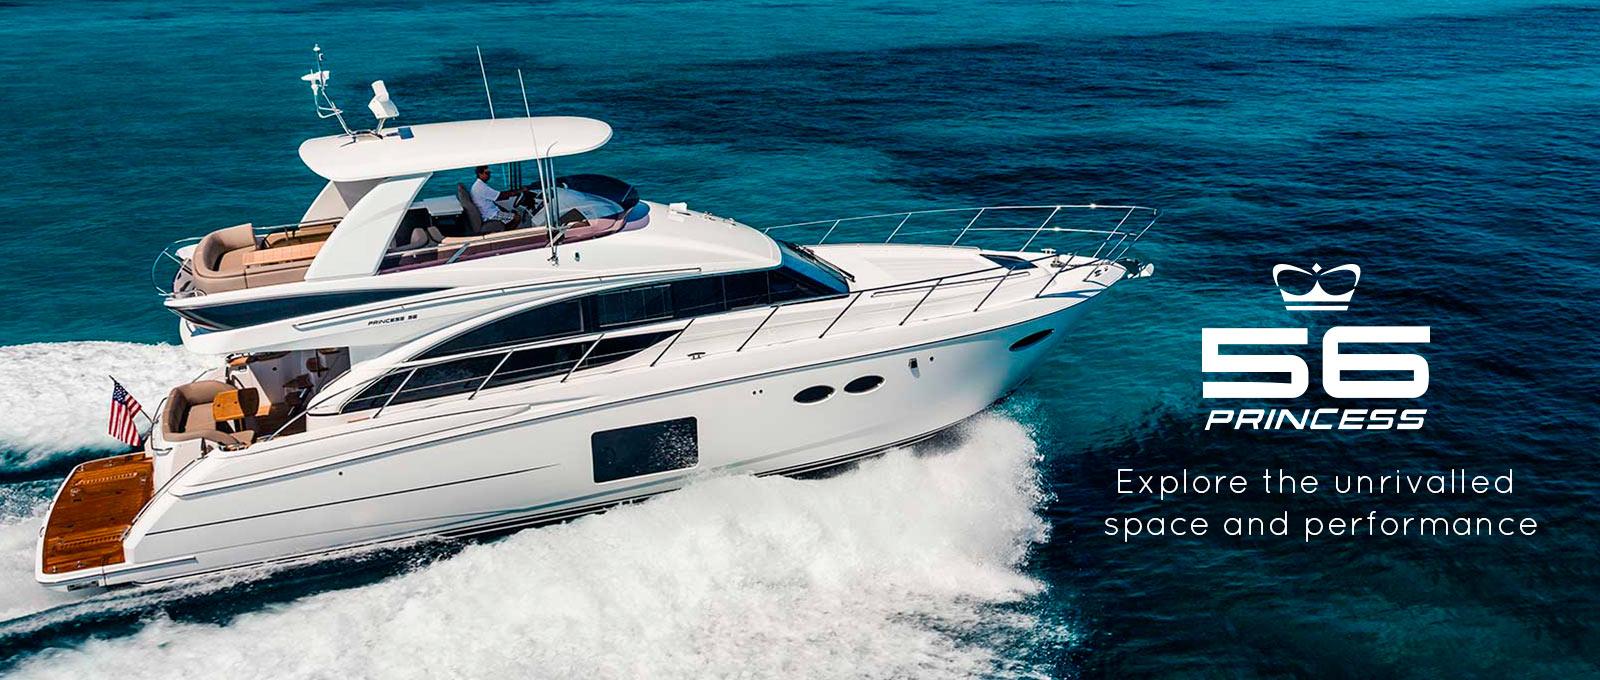 Super Yacht for sale Australia